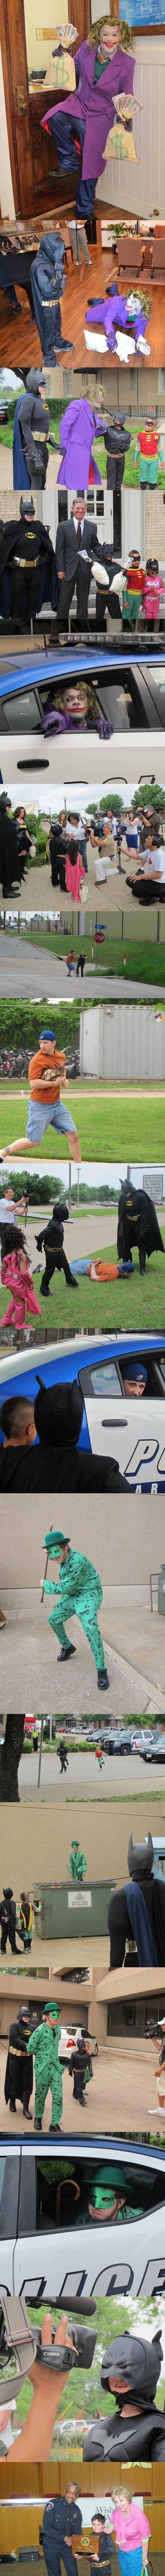 A little story about the batman. For more:- goo.gl/mwCHb. batman